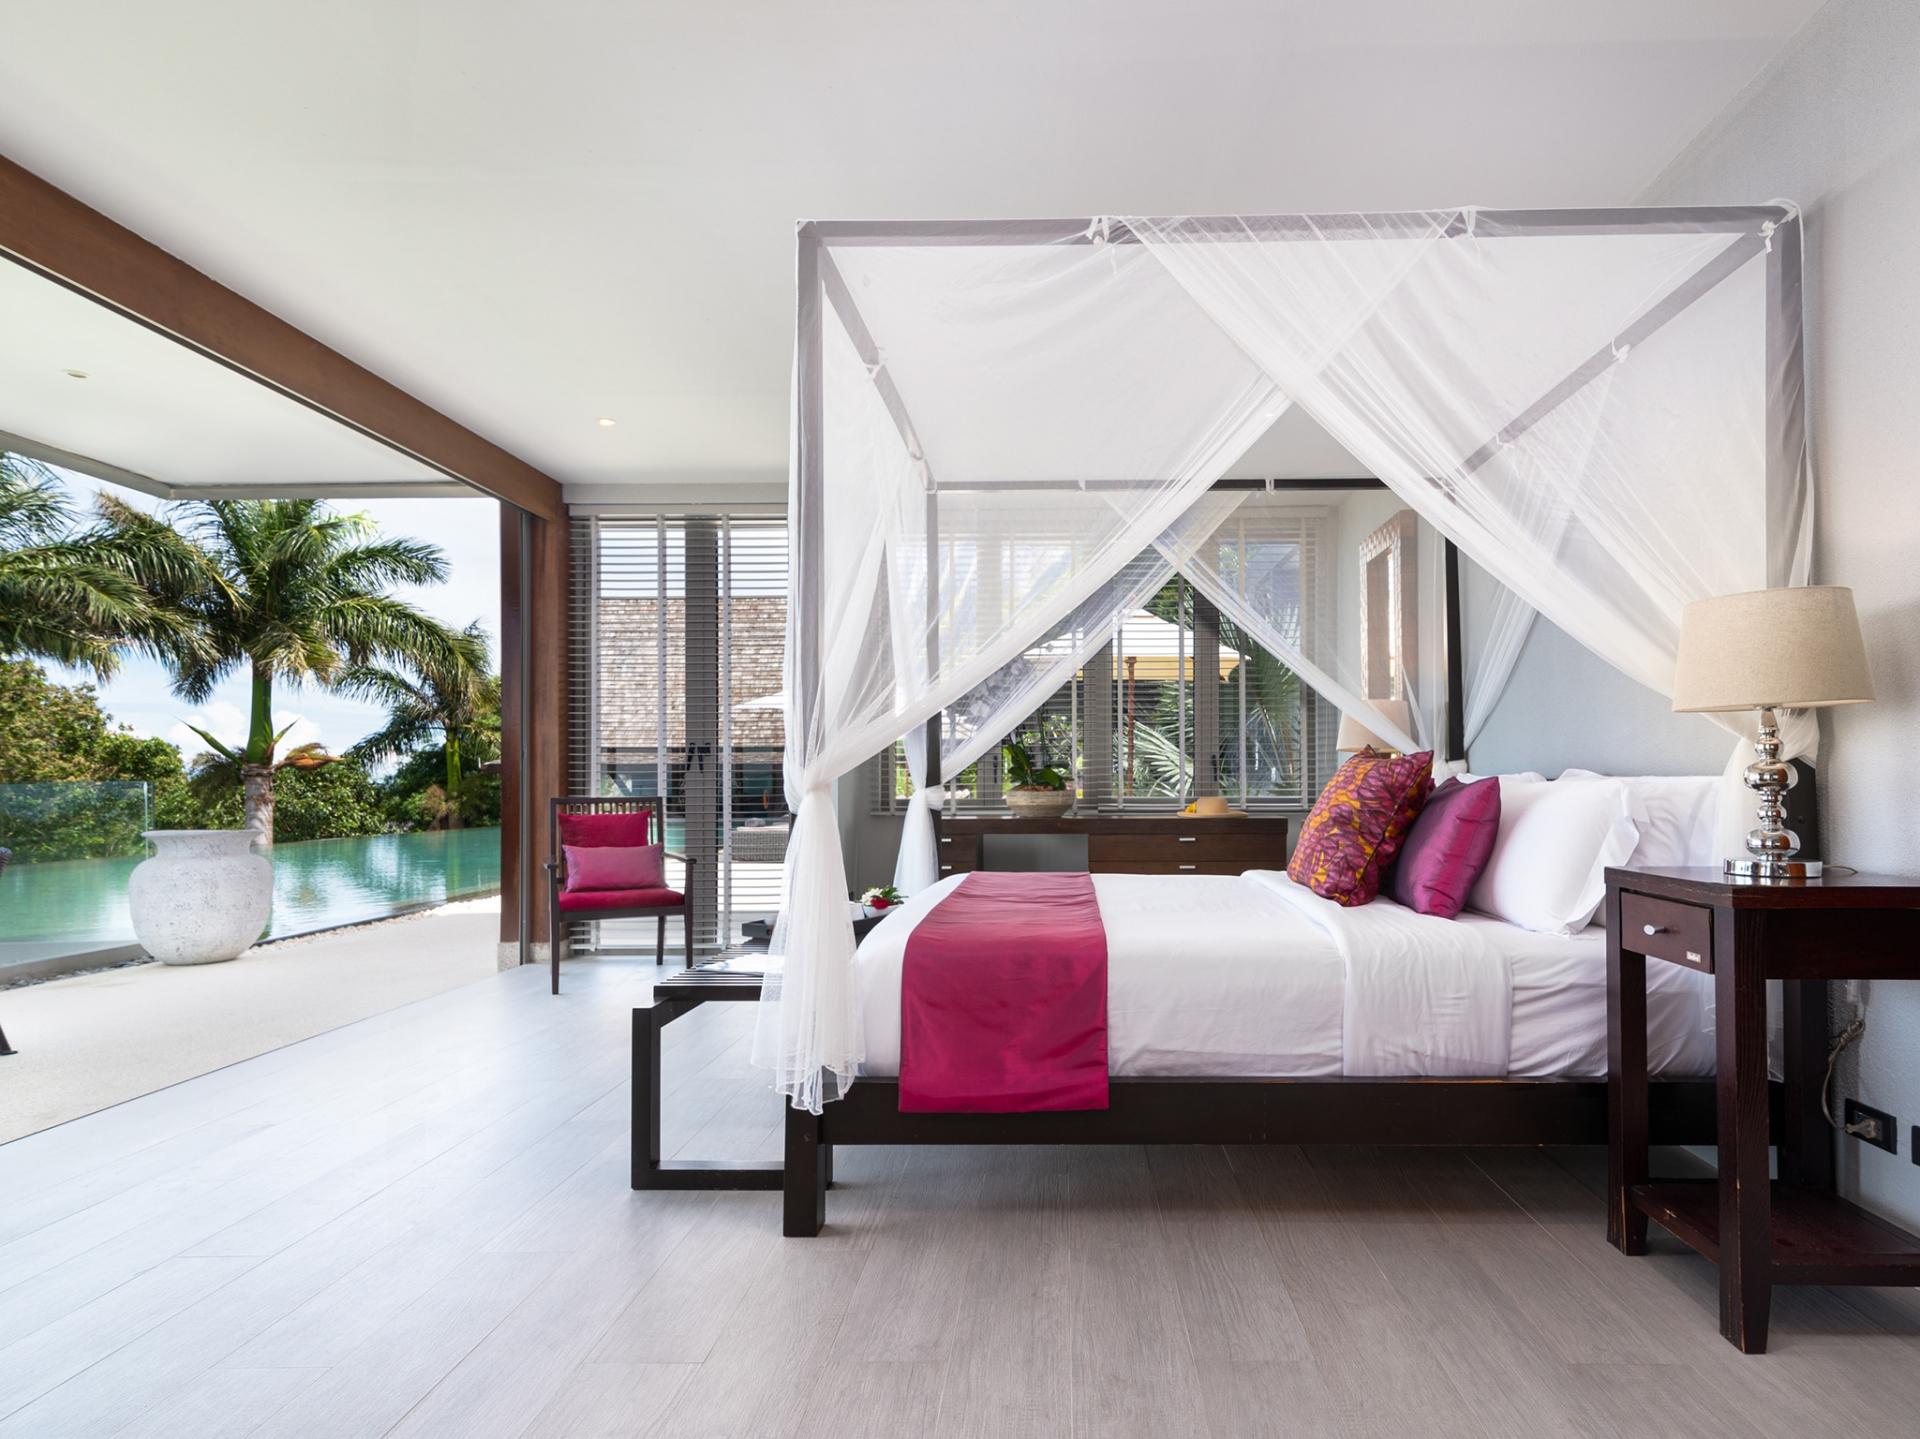 Breathtaking Family Villa-024 Villa Suralai - Poolside master suite view.jpg